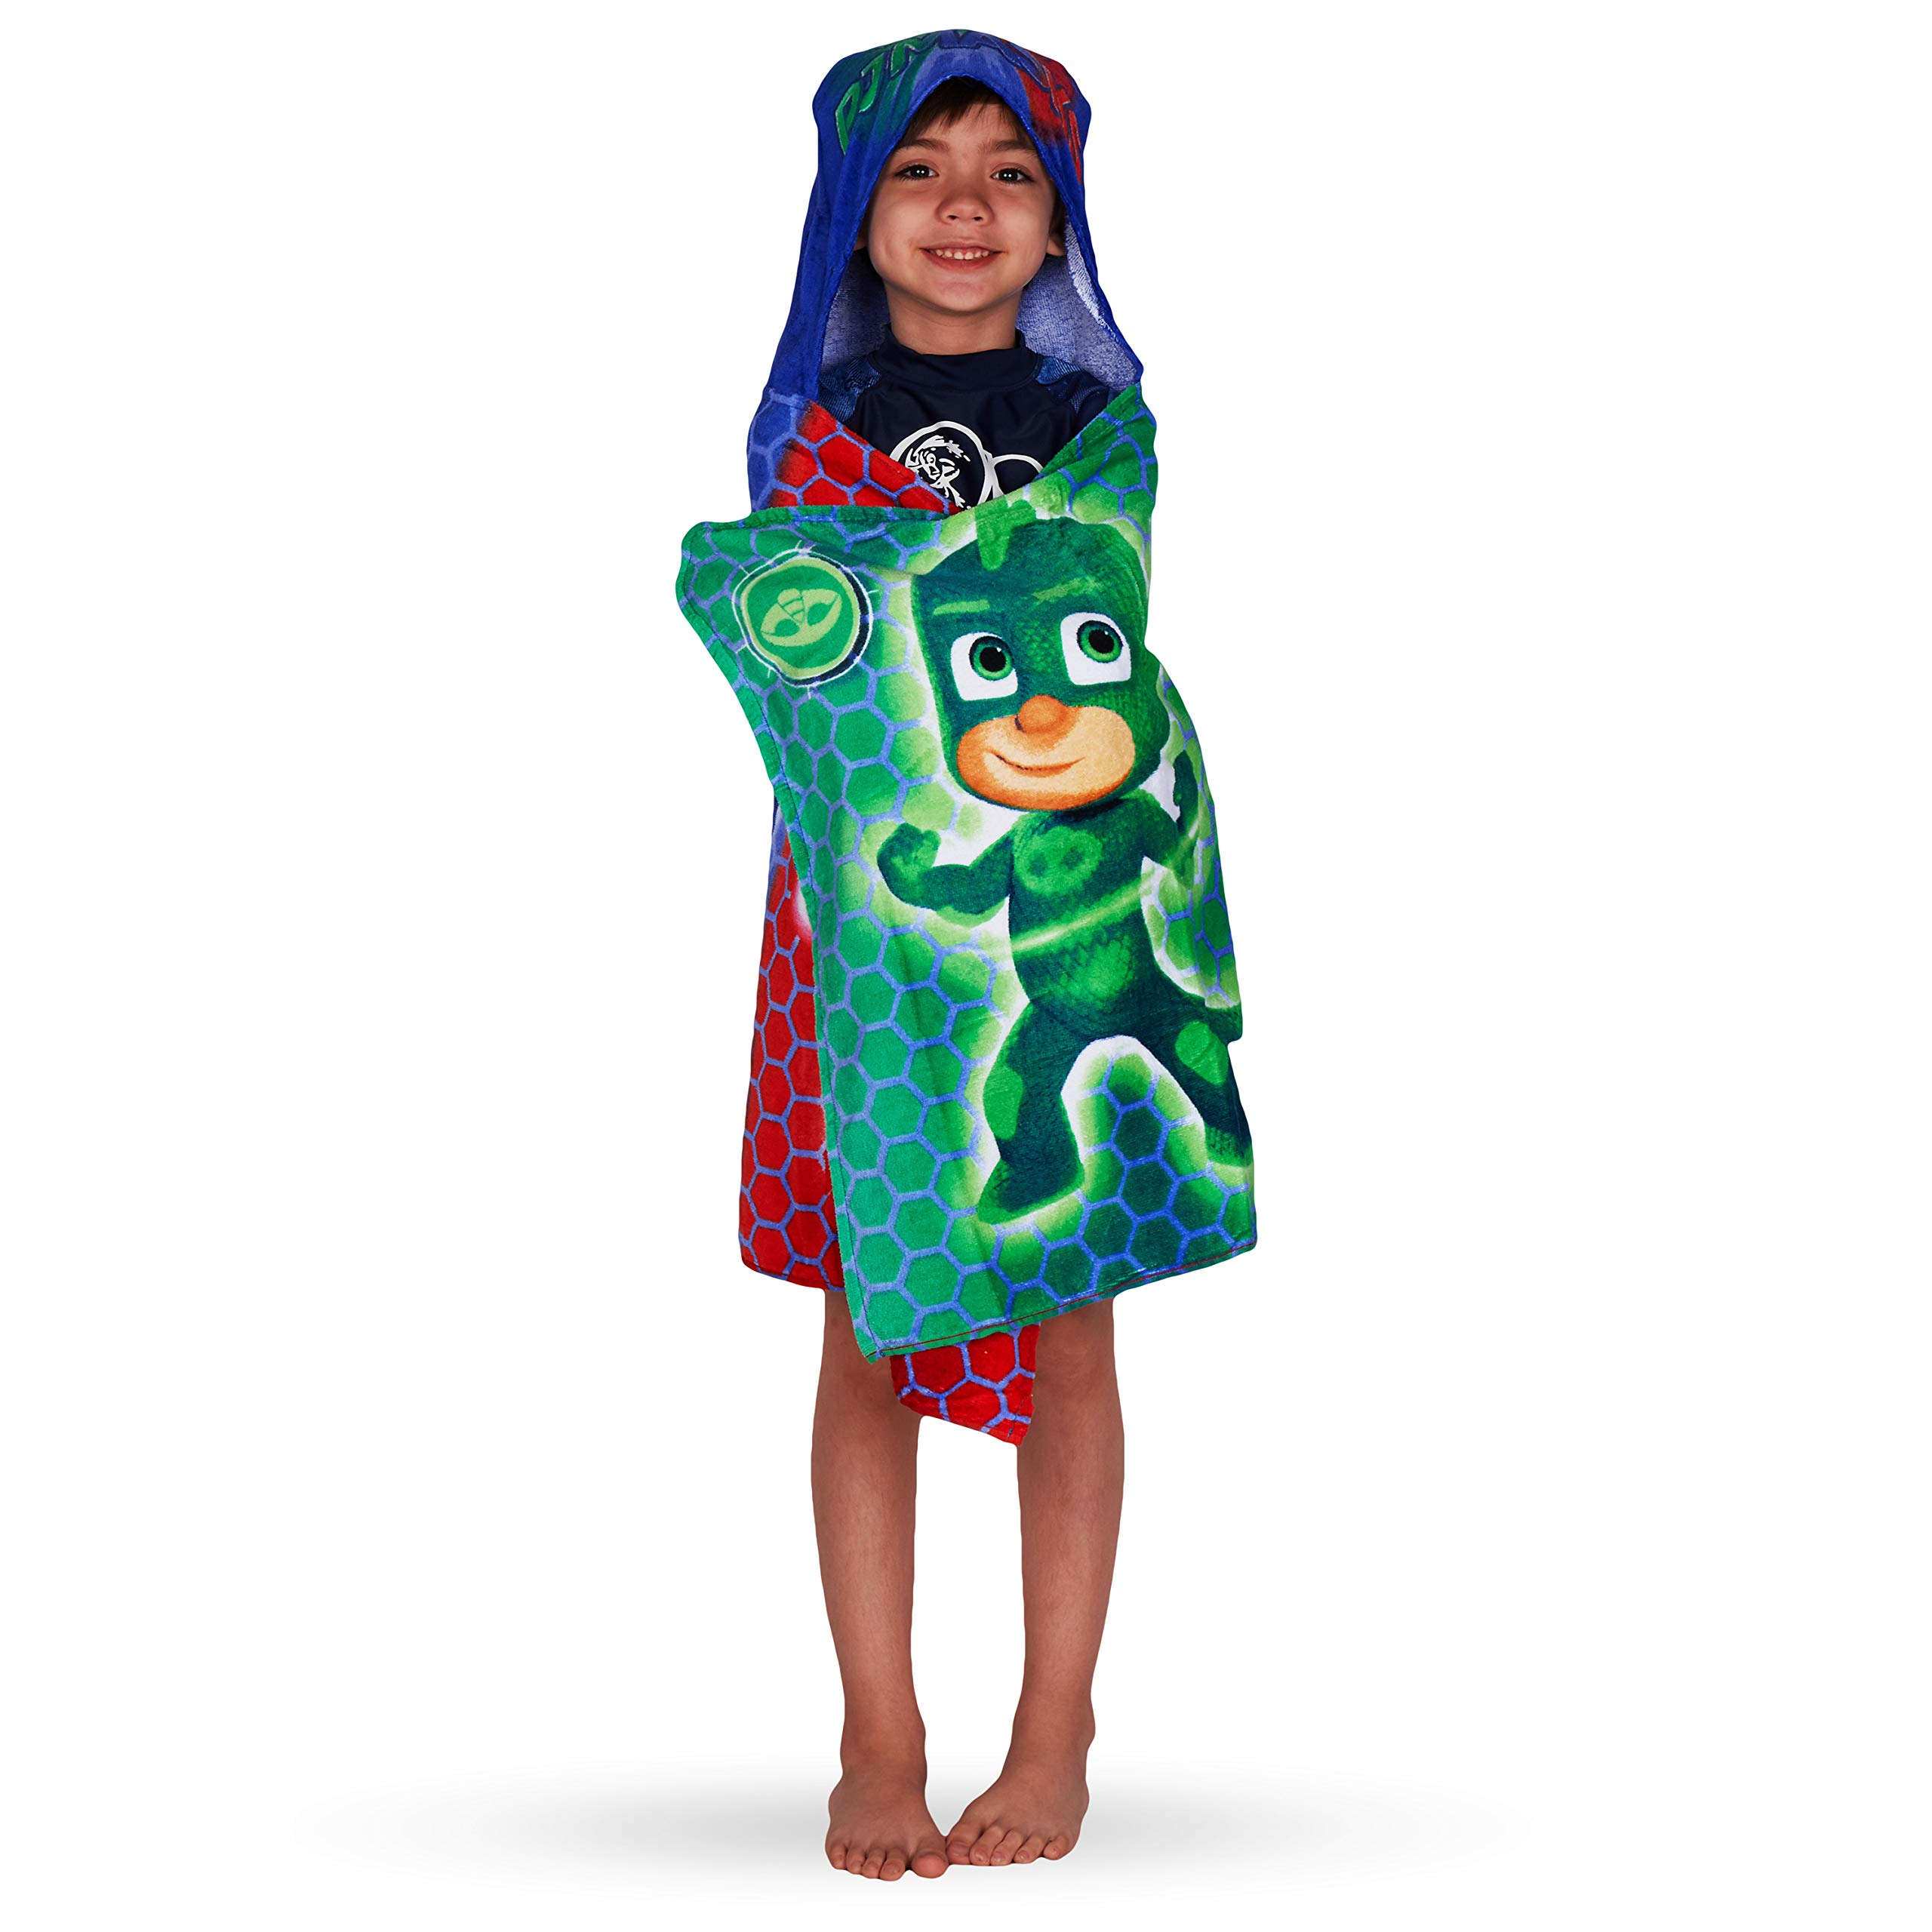 Franco Kids Bath and Beach Soft Cotton Terry Hooded Towel Wrap, 24'' x 50'', PJ Masks by Franco